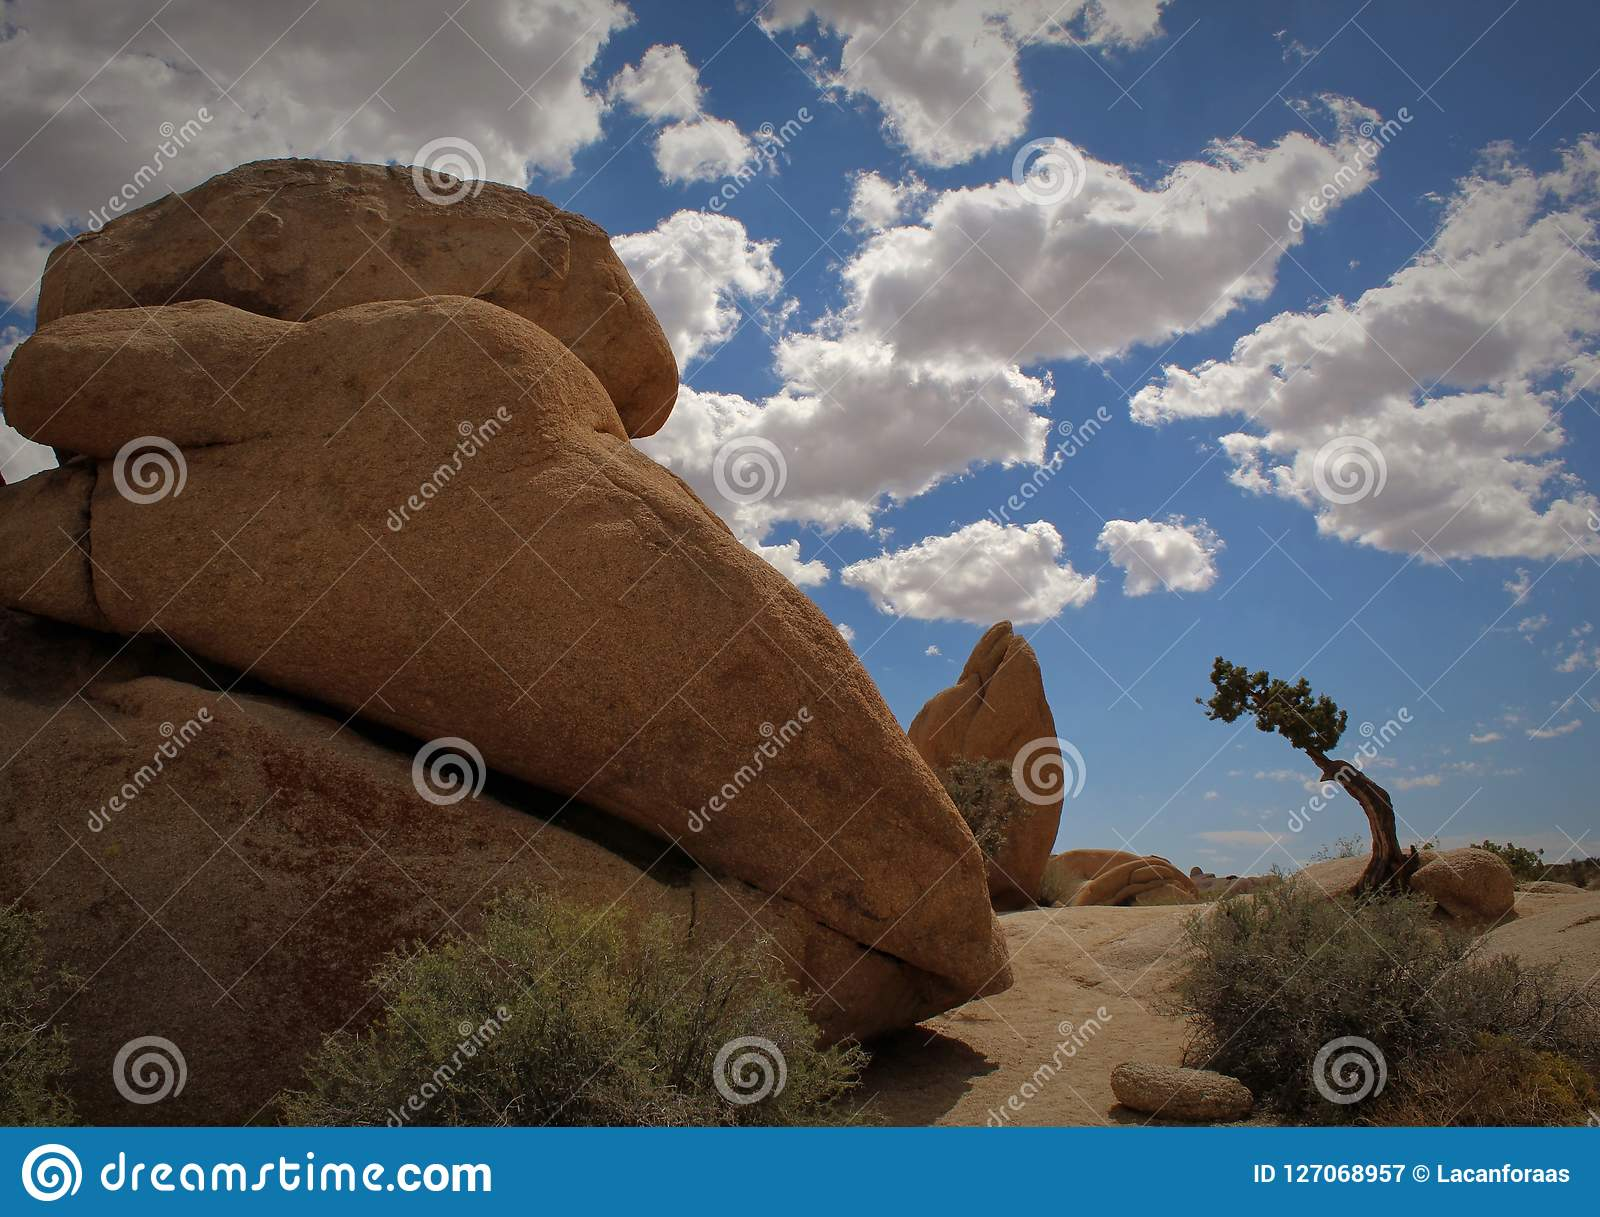 Massive Boulders At Jumbo Rocks Campground Joshua Tree